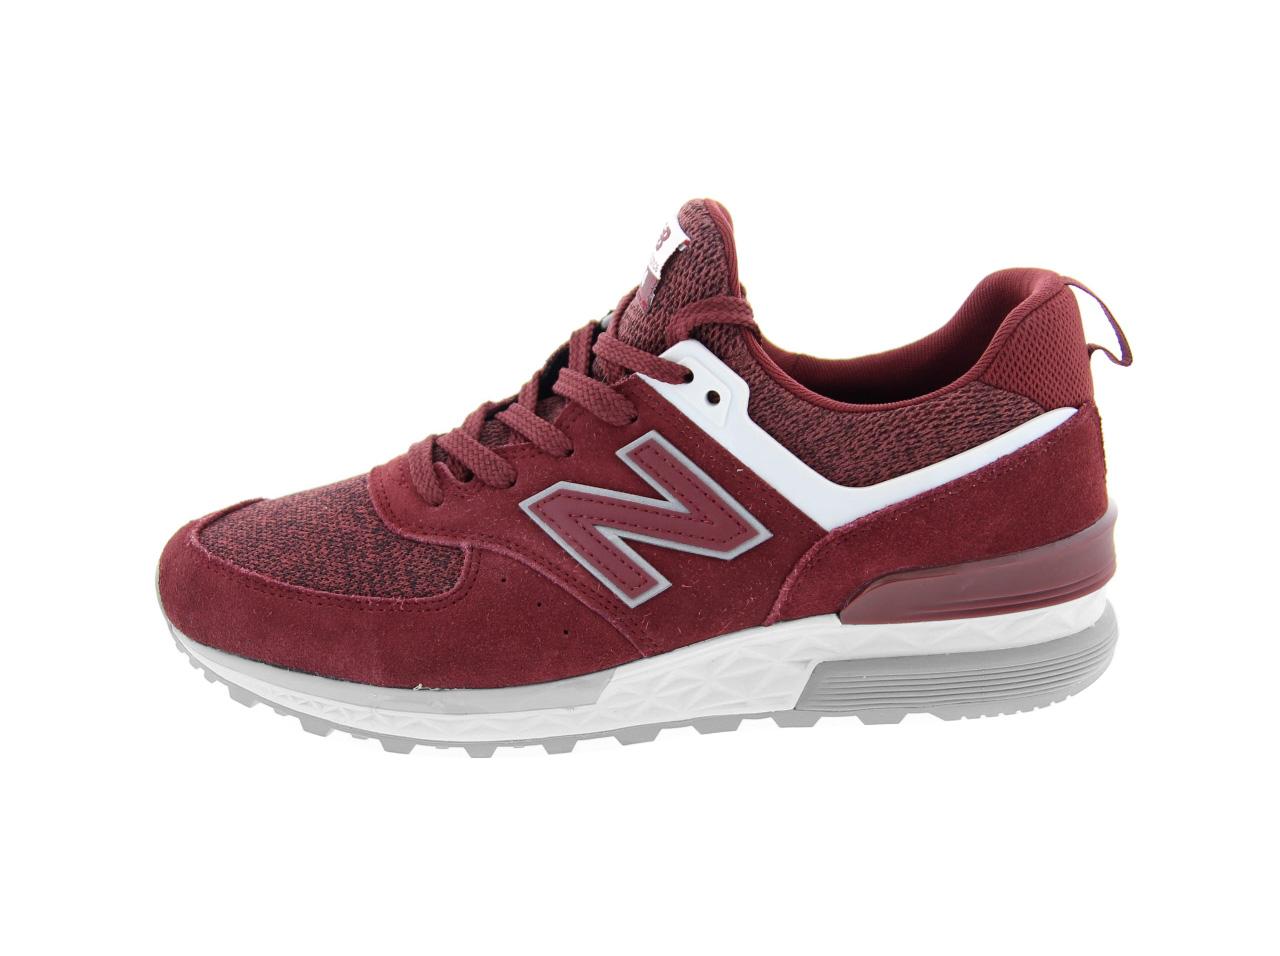 (ms574ce) 【特価】 BURGUNDY new balance MS574CE 【靴】 【ニューバランス MS573CE】 【スニーカー】